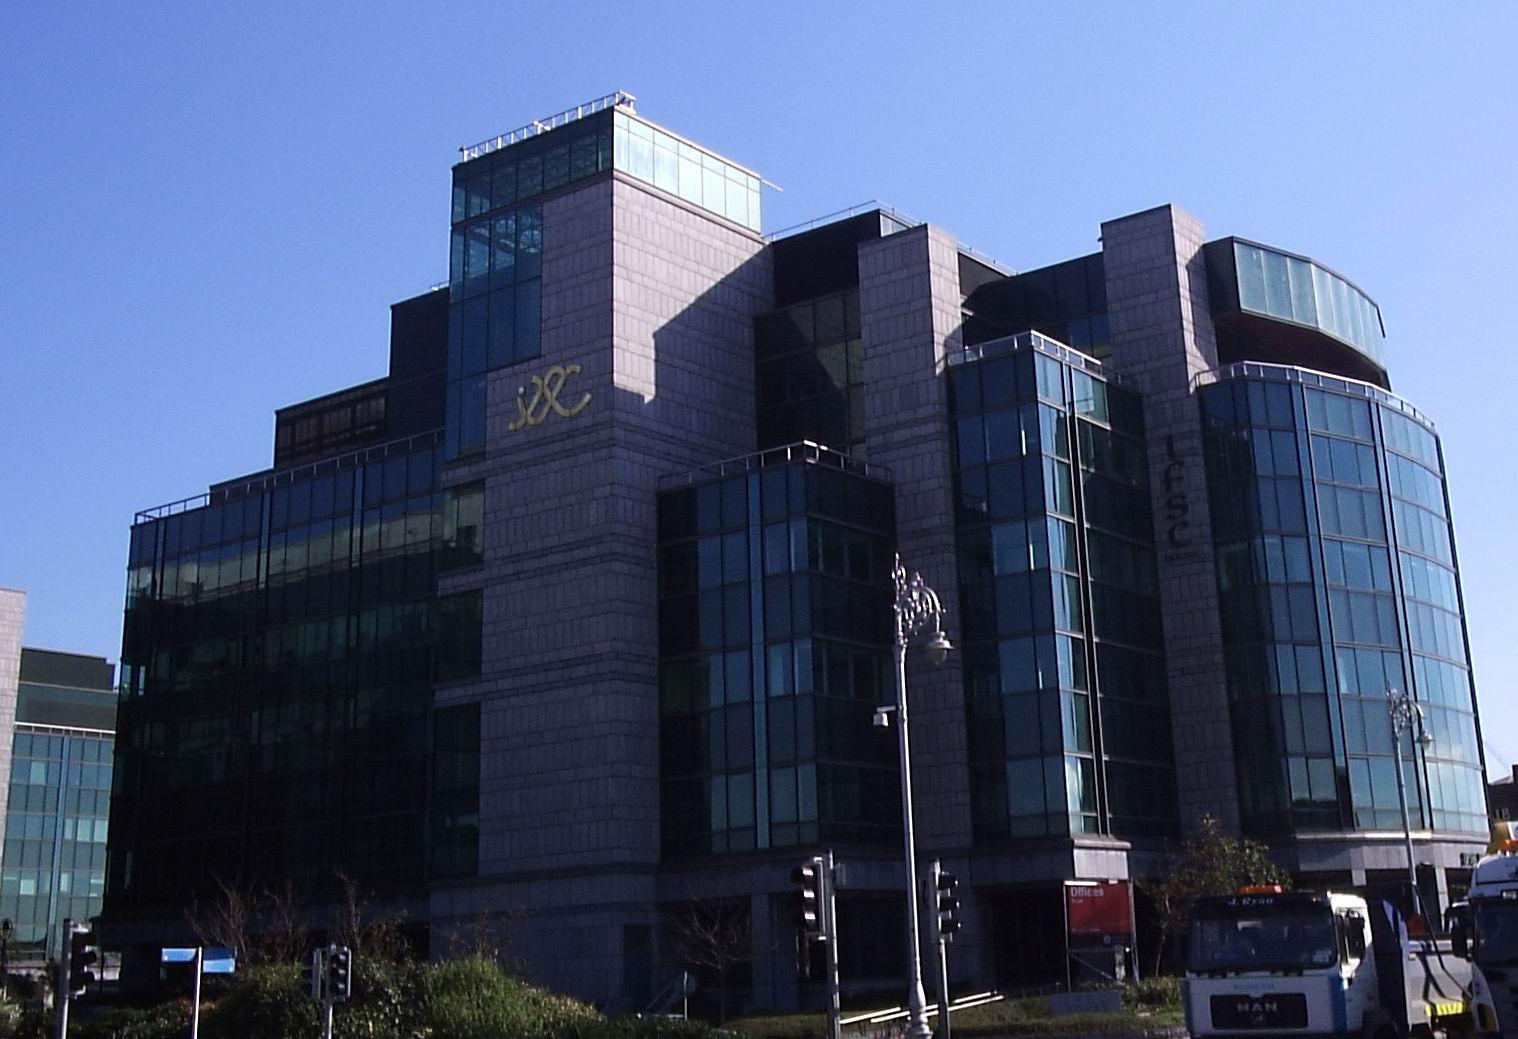 Modern Architecture Dublin dublin - baile Átha cliath - wikimedia commons